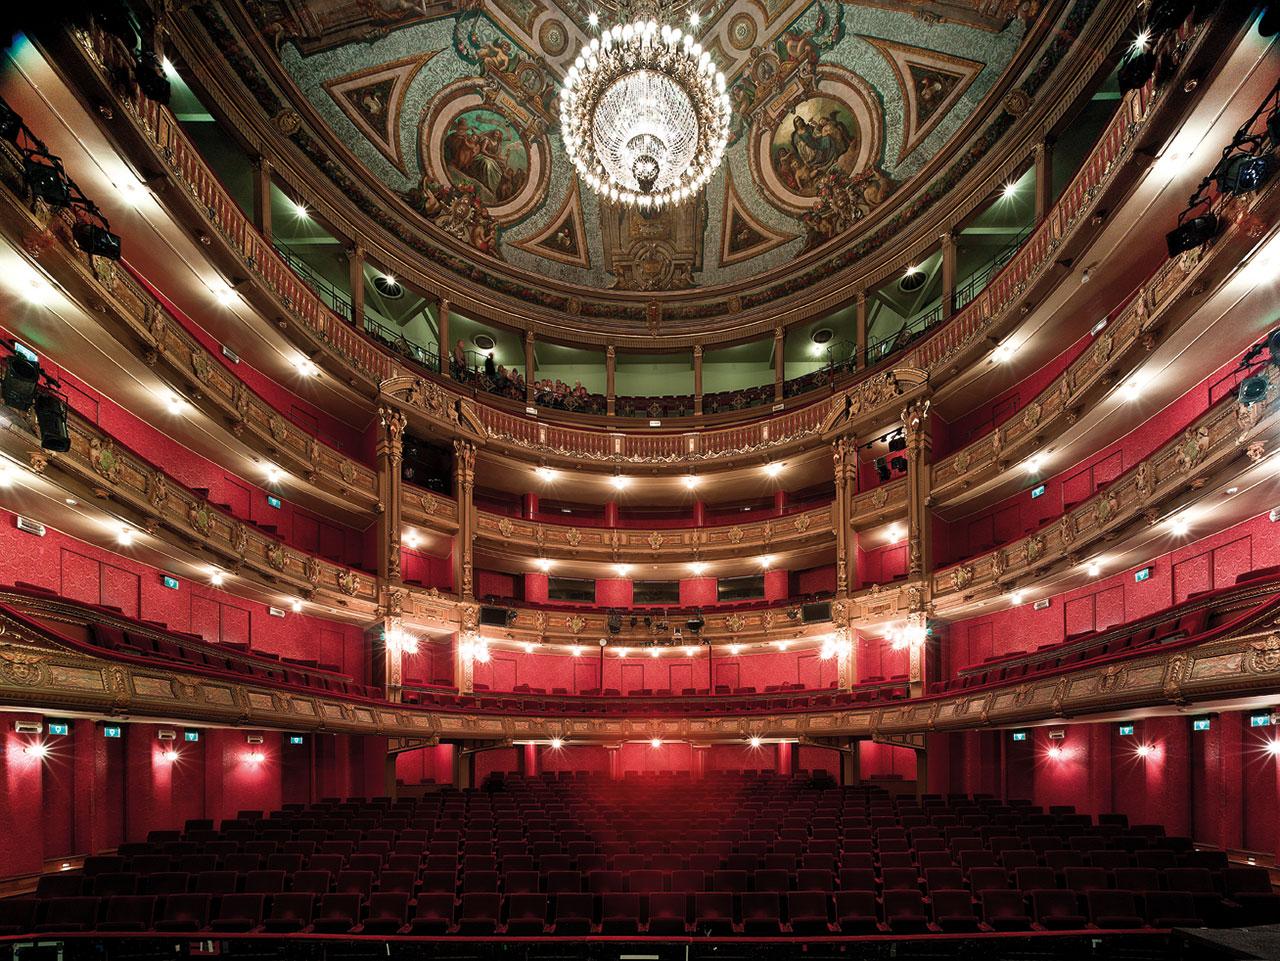 Impulse responses opera of ghent for Interieur antwerpen